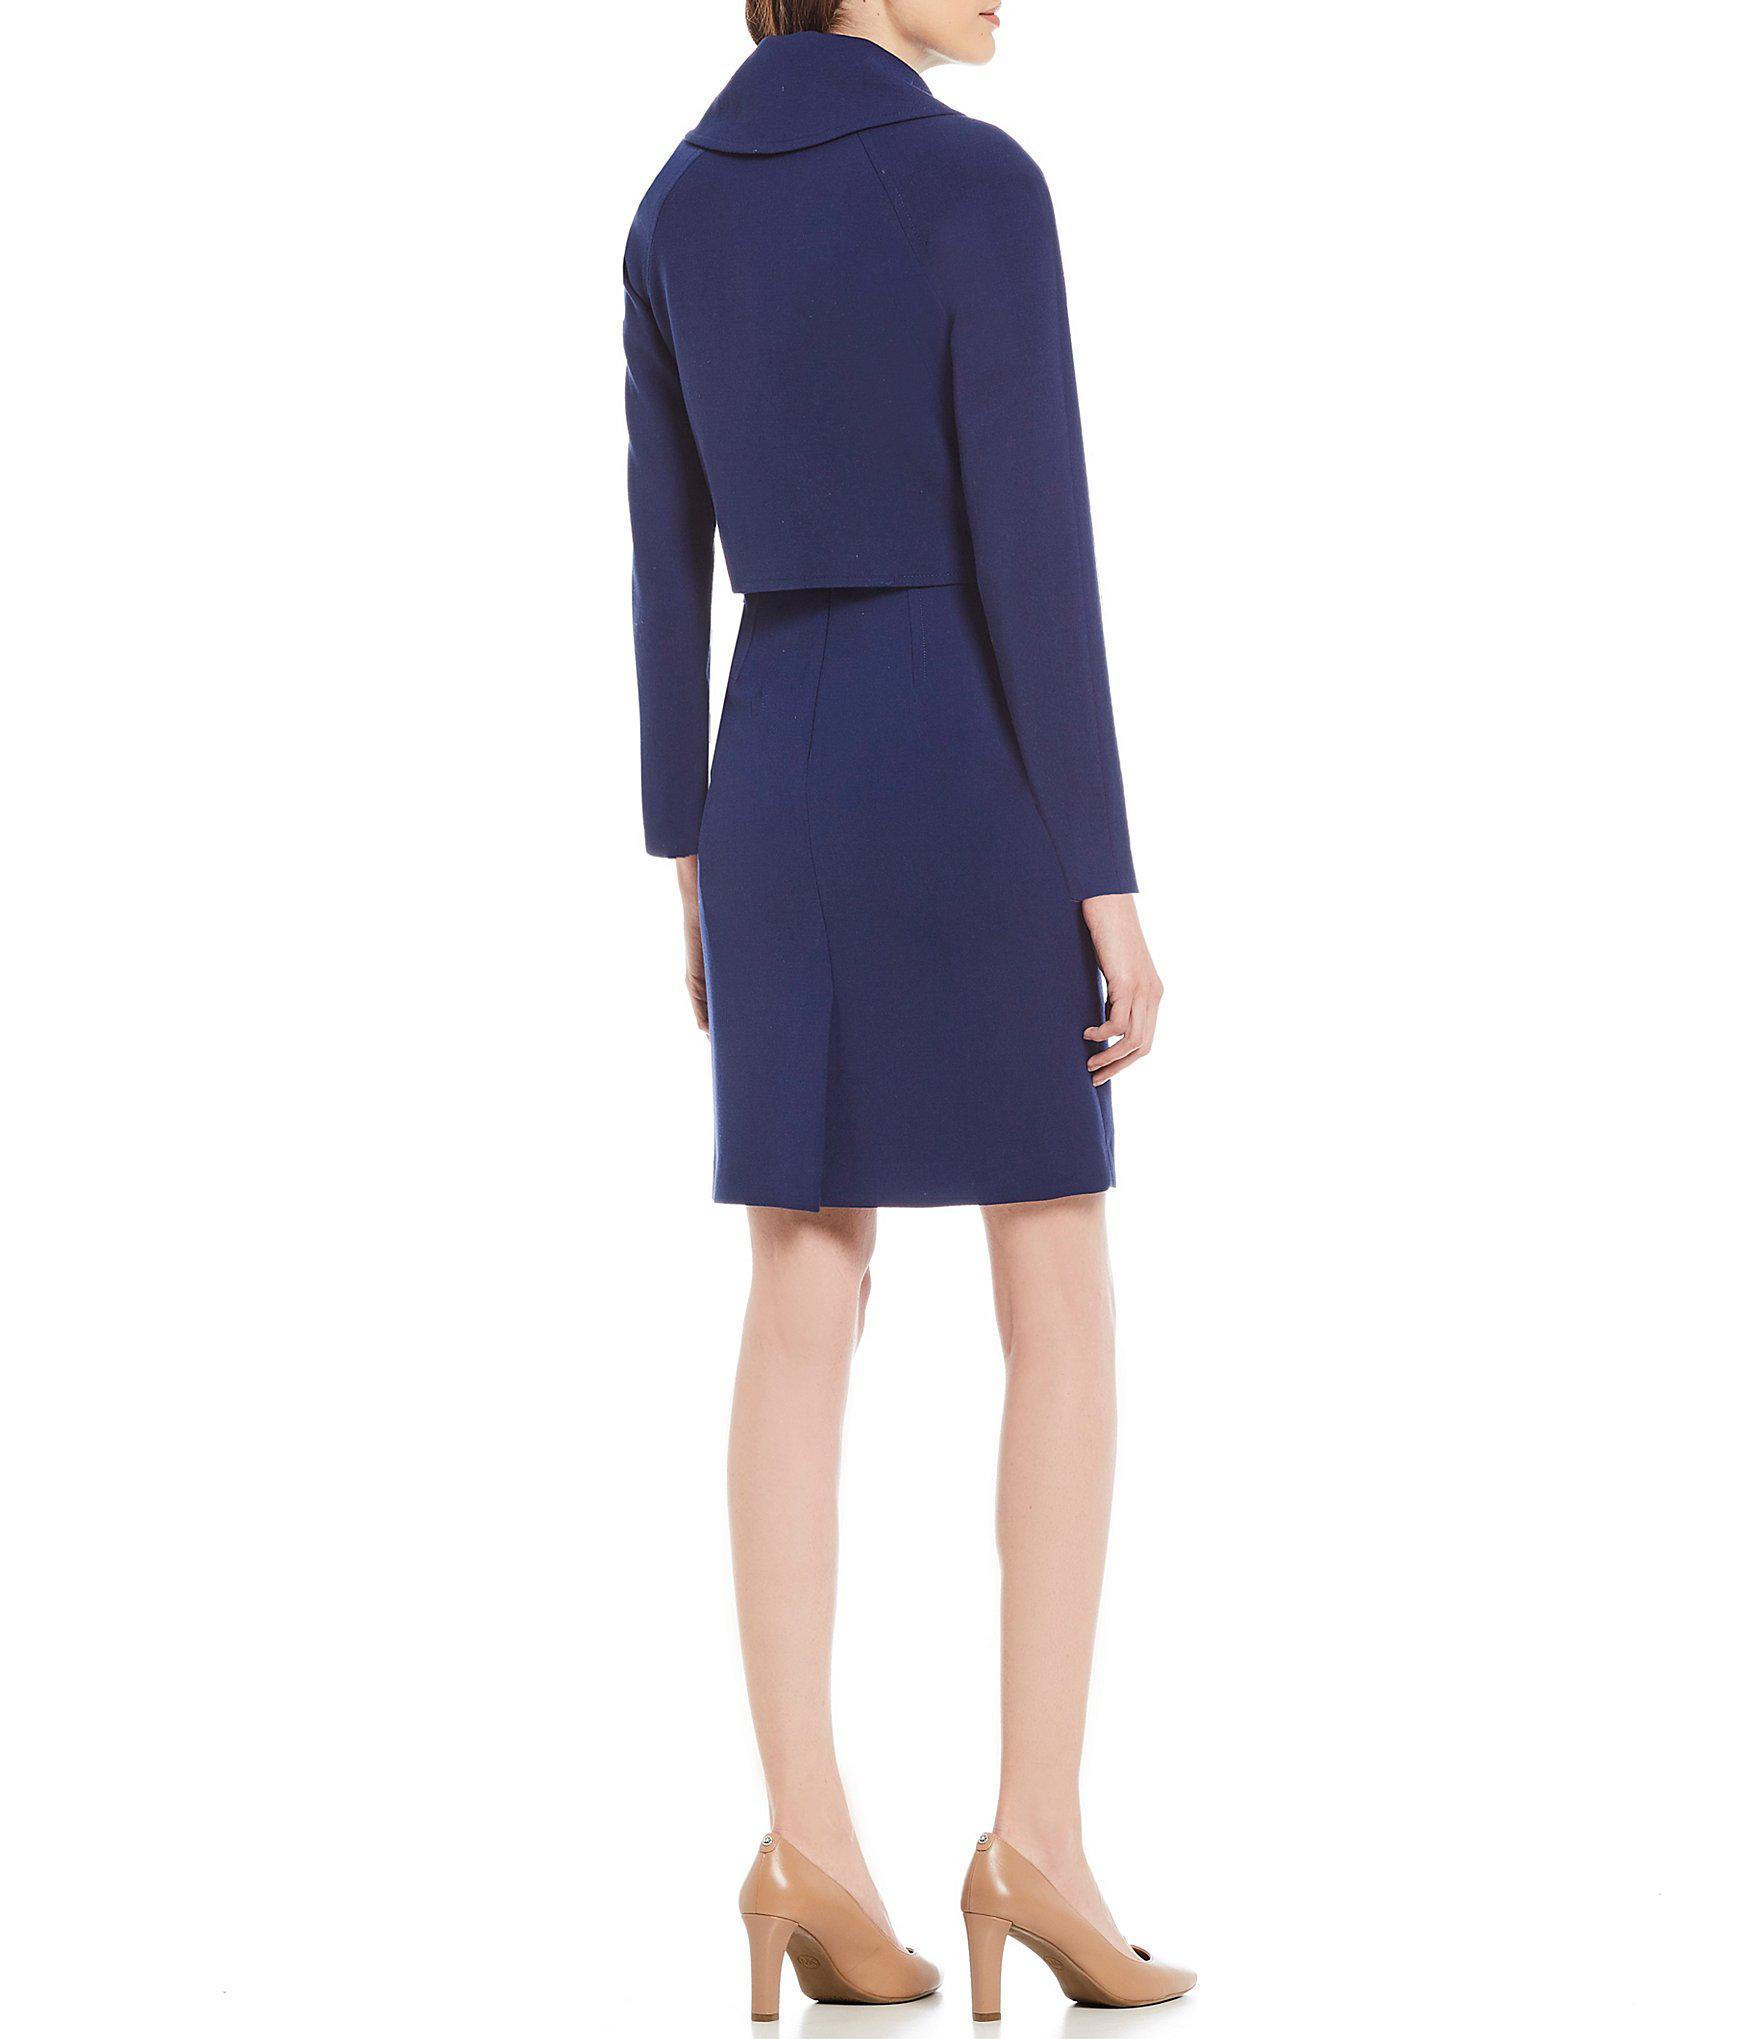 19cb643b8391 Tahari - Blue Petite Size Fold Over Jacket Dress Suit - Lyst. View  fullscreen